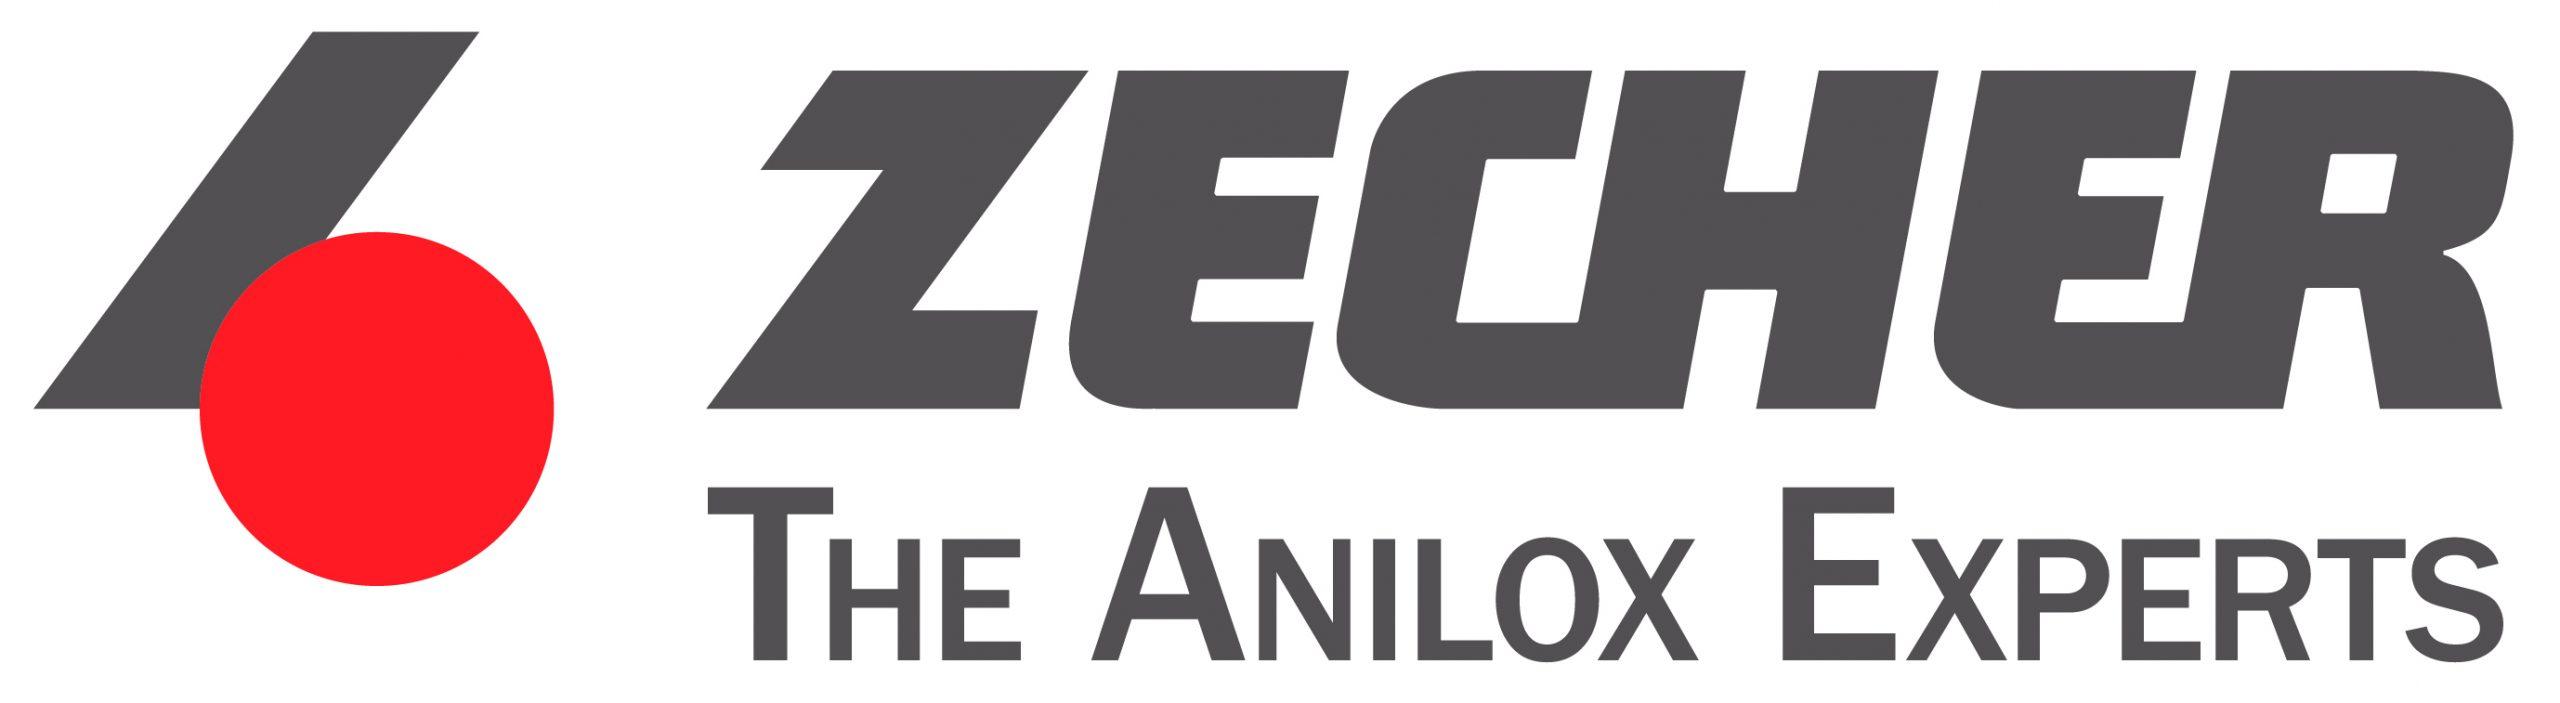 Zecher are a respected Friend & Partner of Alphasonics. This is their logo.